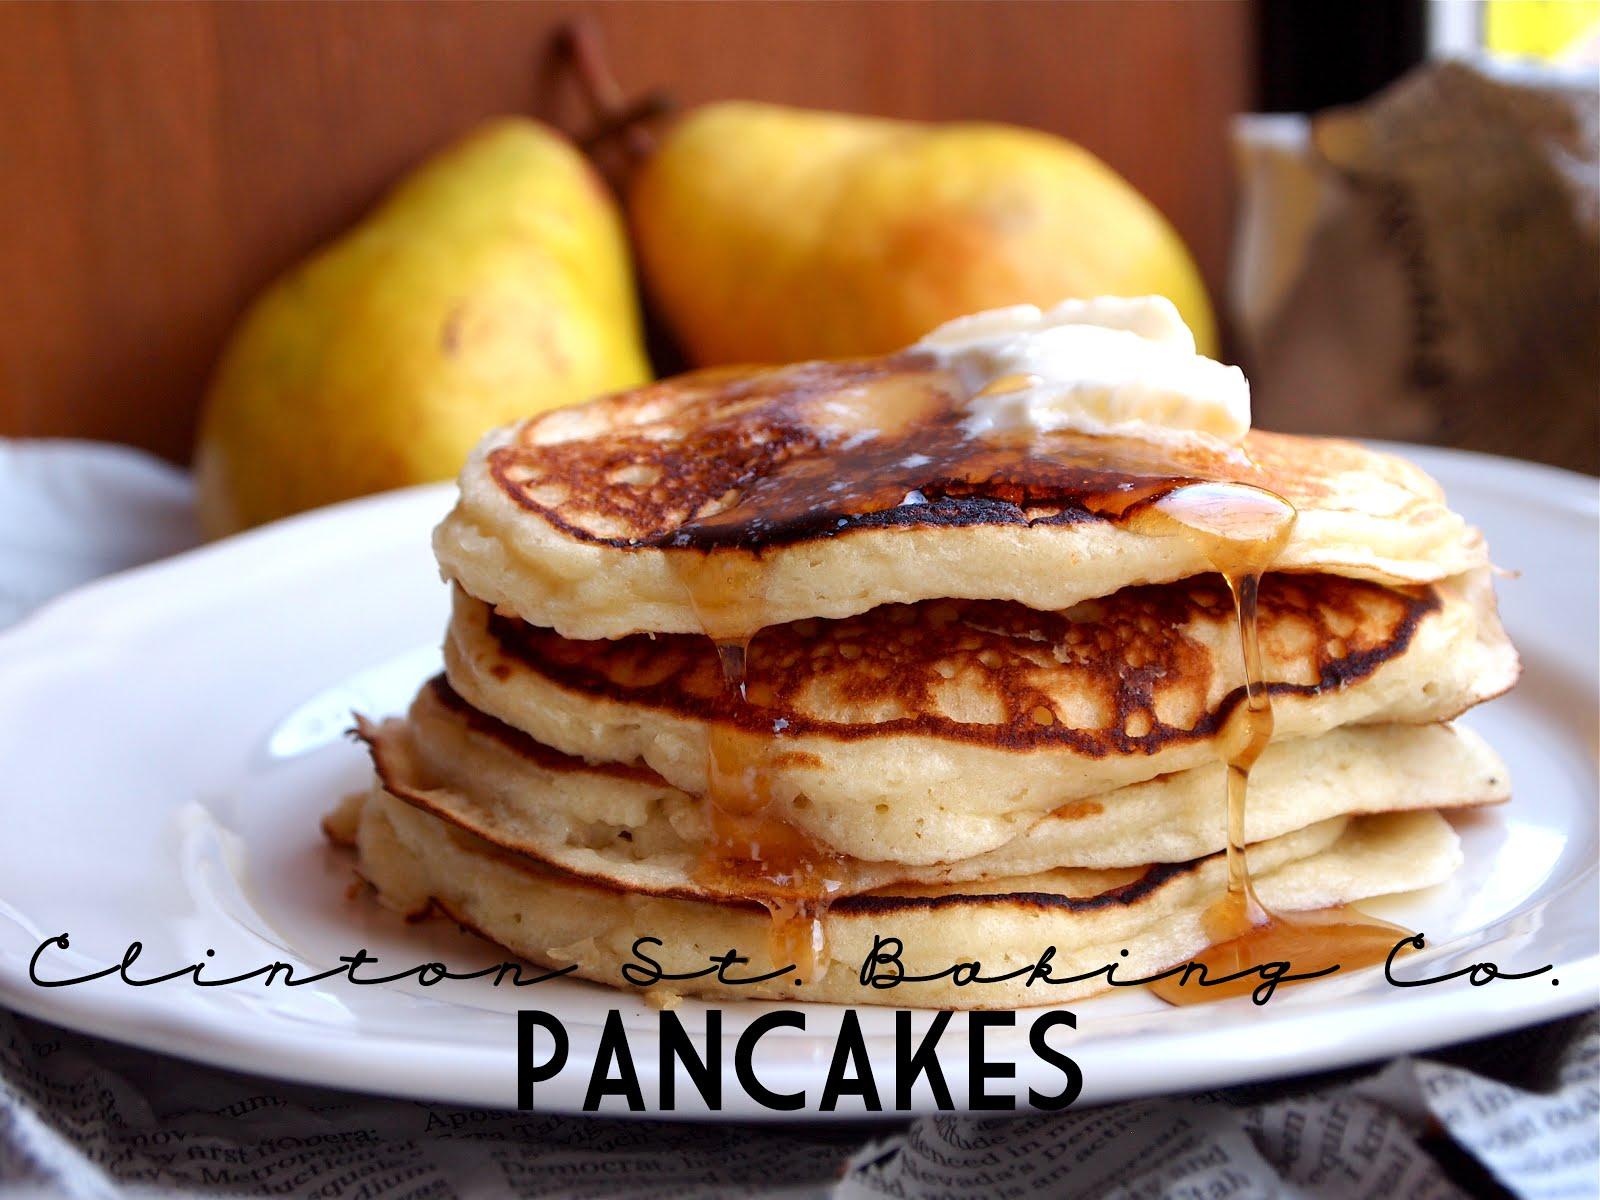 P B and J Eats: Clinton St. Baking Co. Pancakes